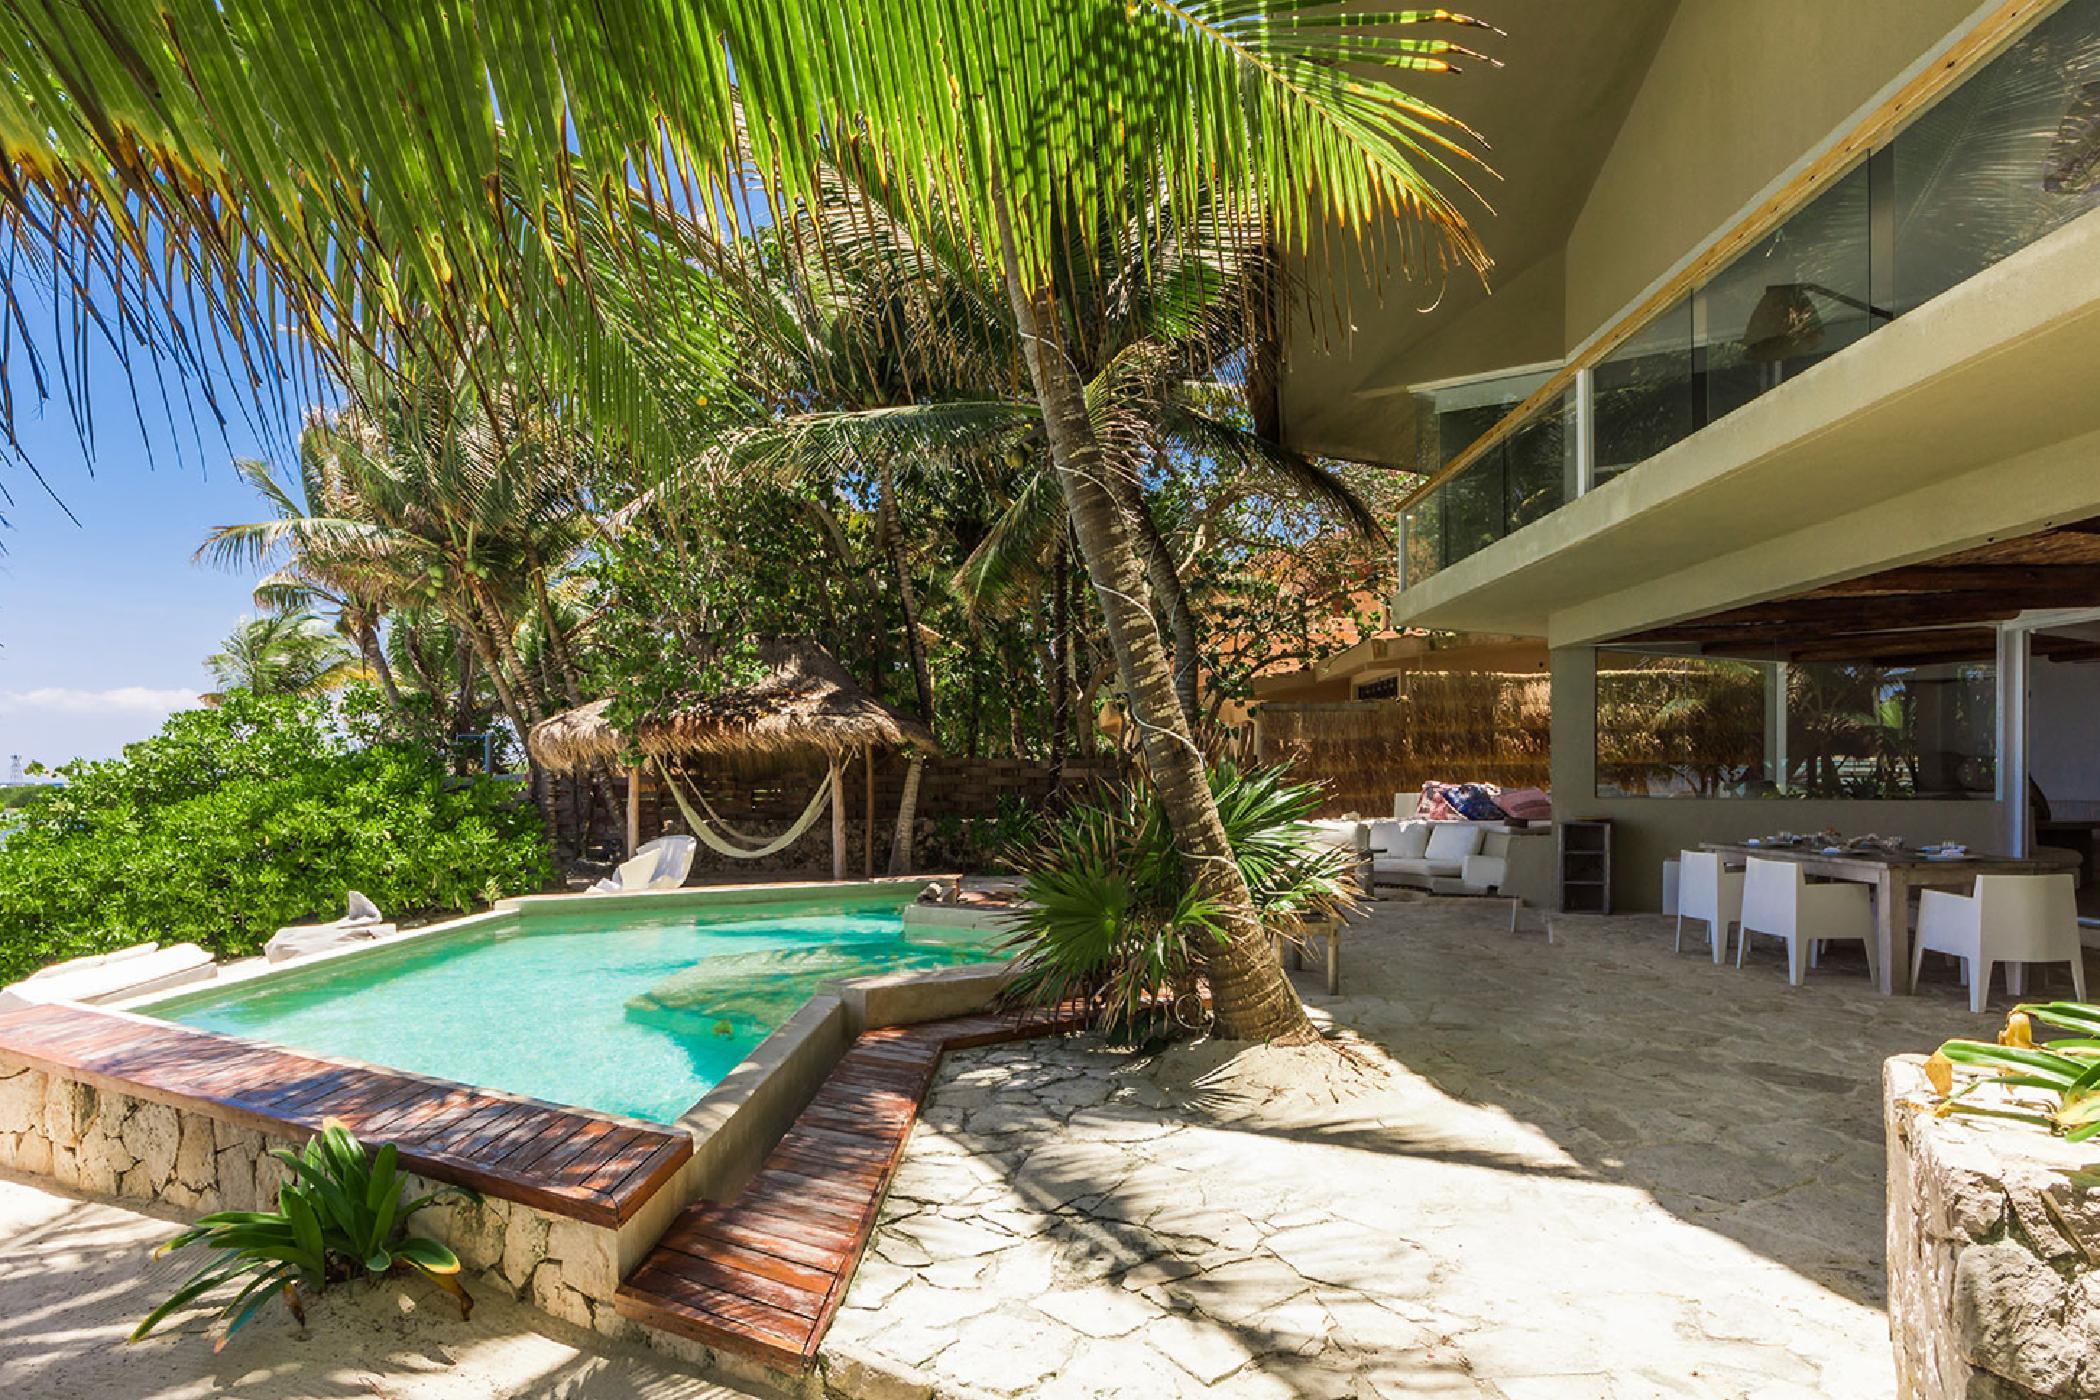 Maya_Luxe_Riviera_Maya_Luxury_Villas_Experiences_Puerto_Aventuras_5_Bedrooms_Zacil_Na_6.jpg